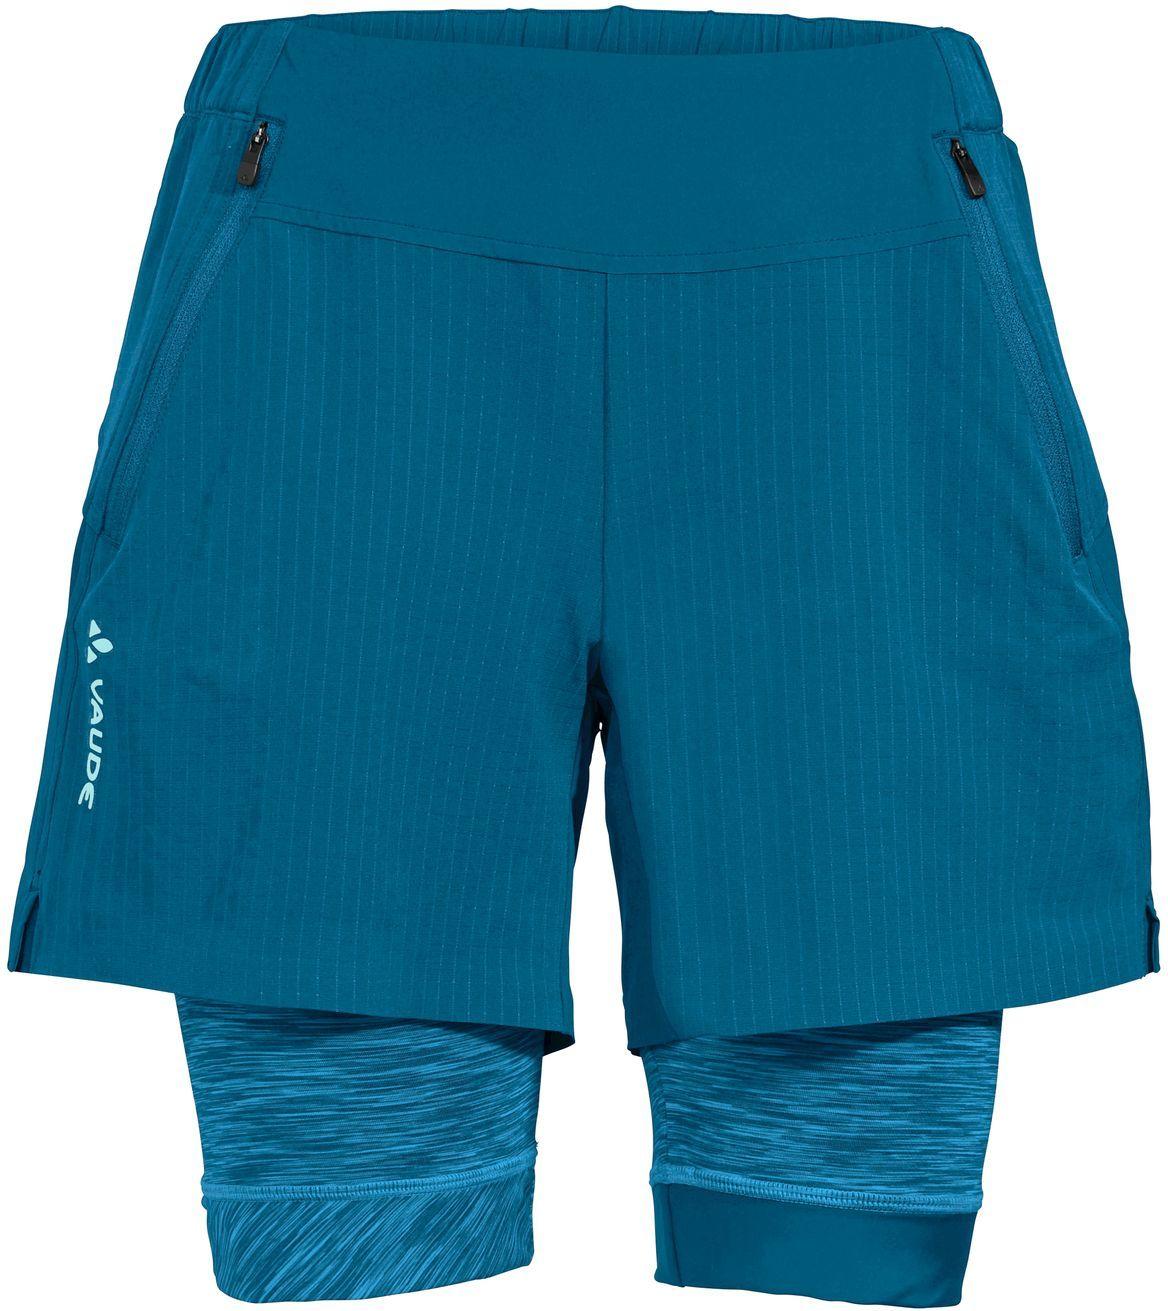 Vaude Women's Altissimi Shorts - kingfisher XS